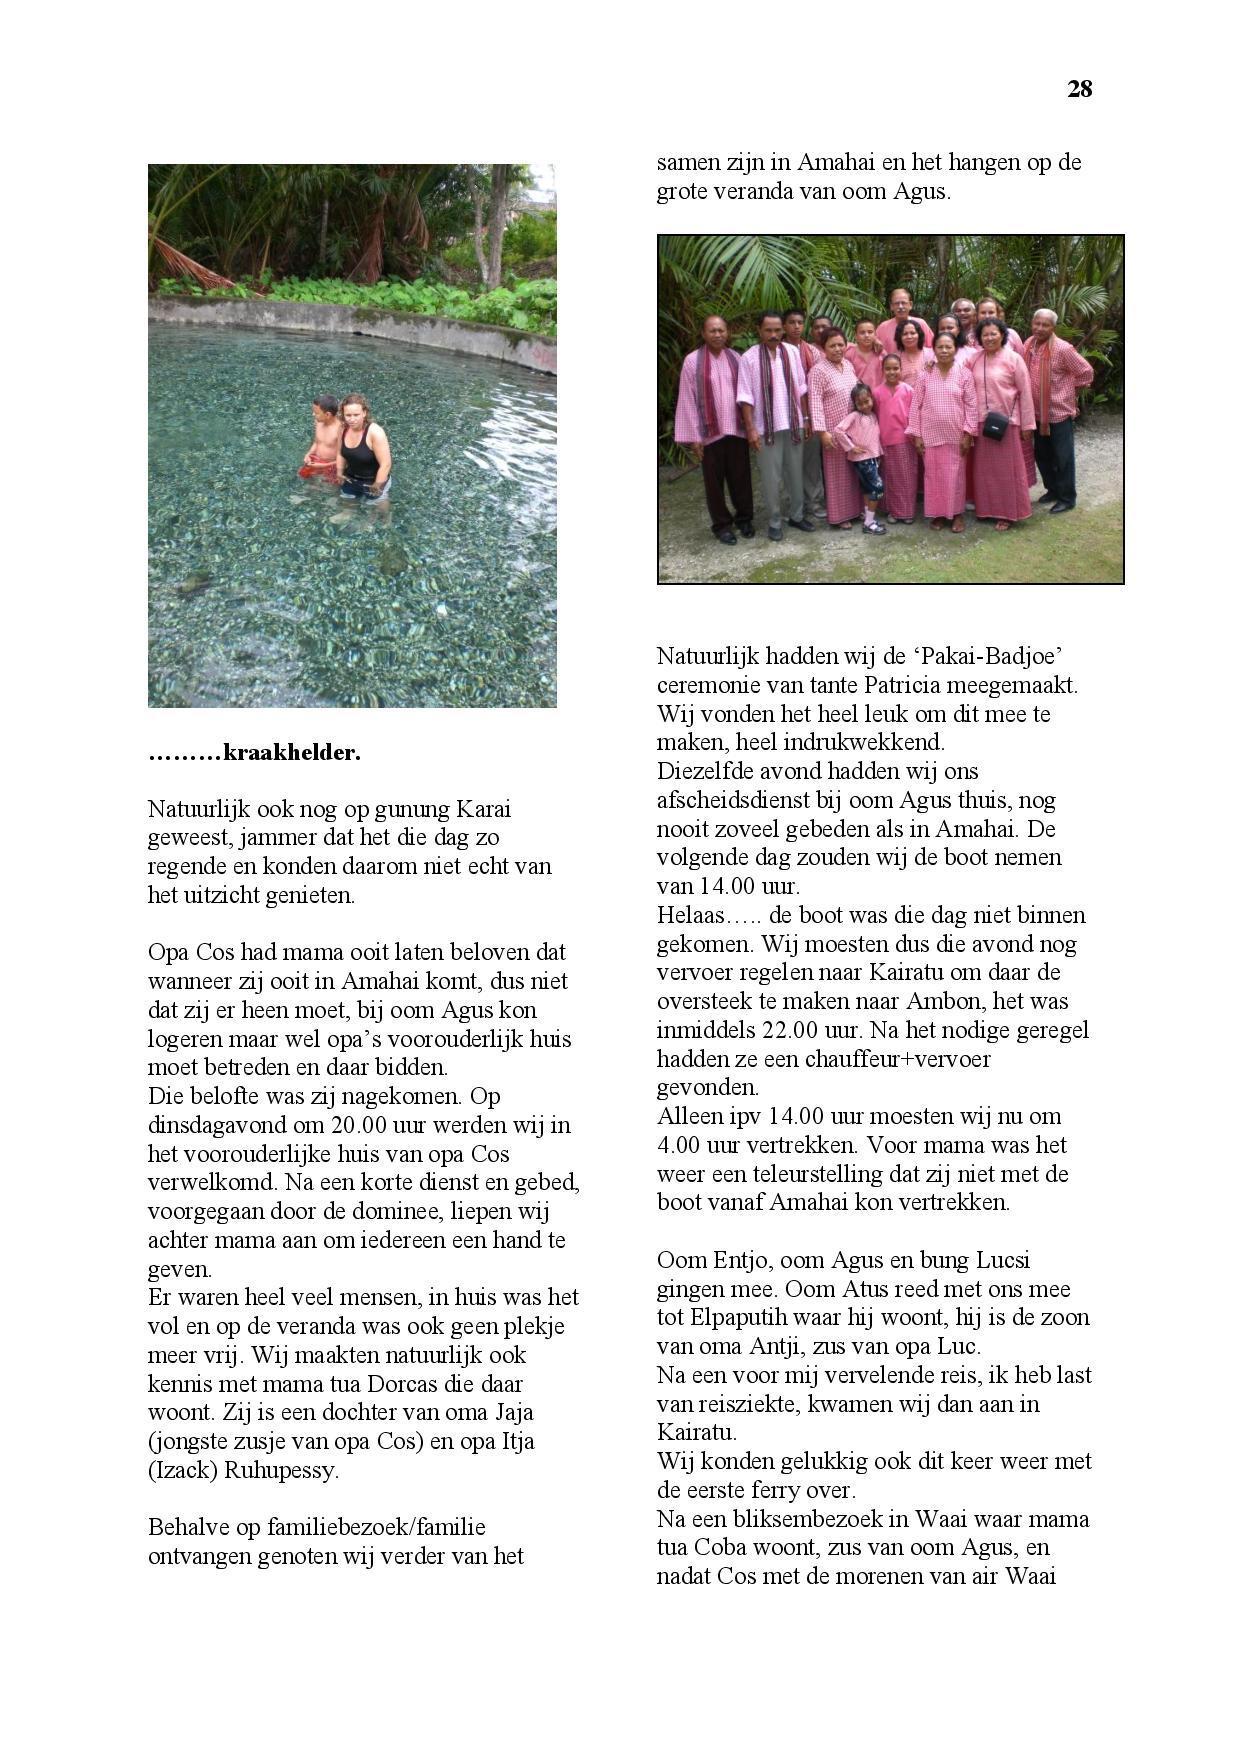 Saka Mese 3e jaargang nr. 02-2007 definitieve webversie-page-028